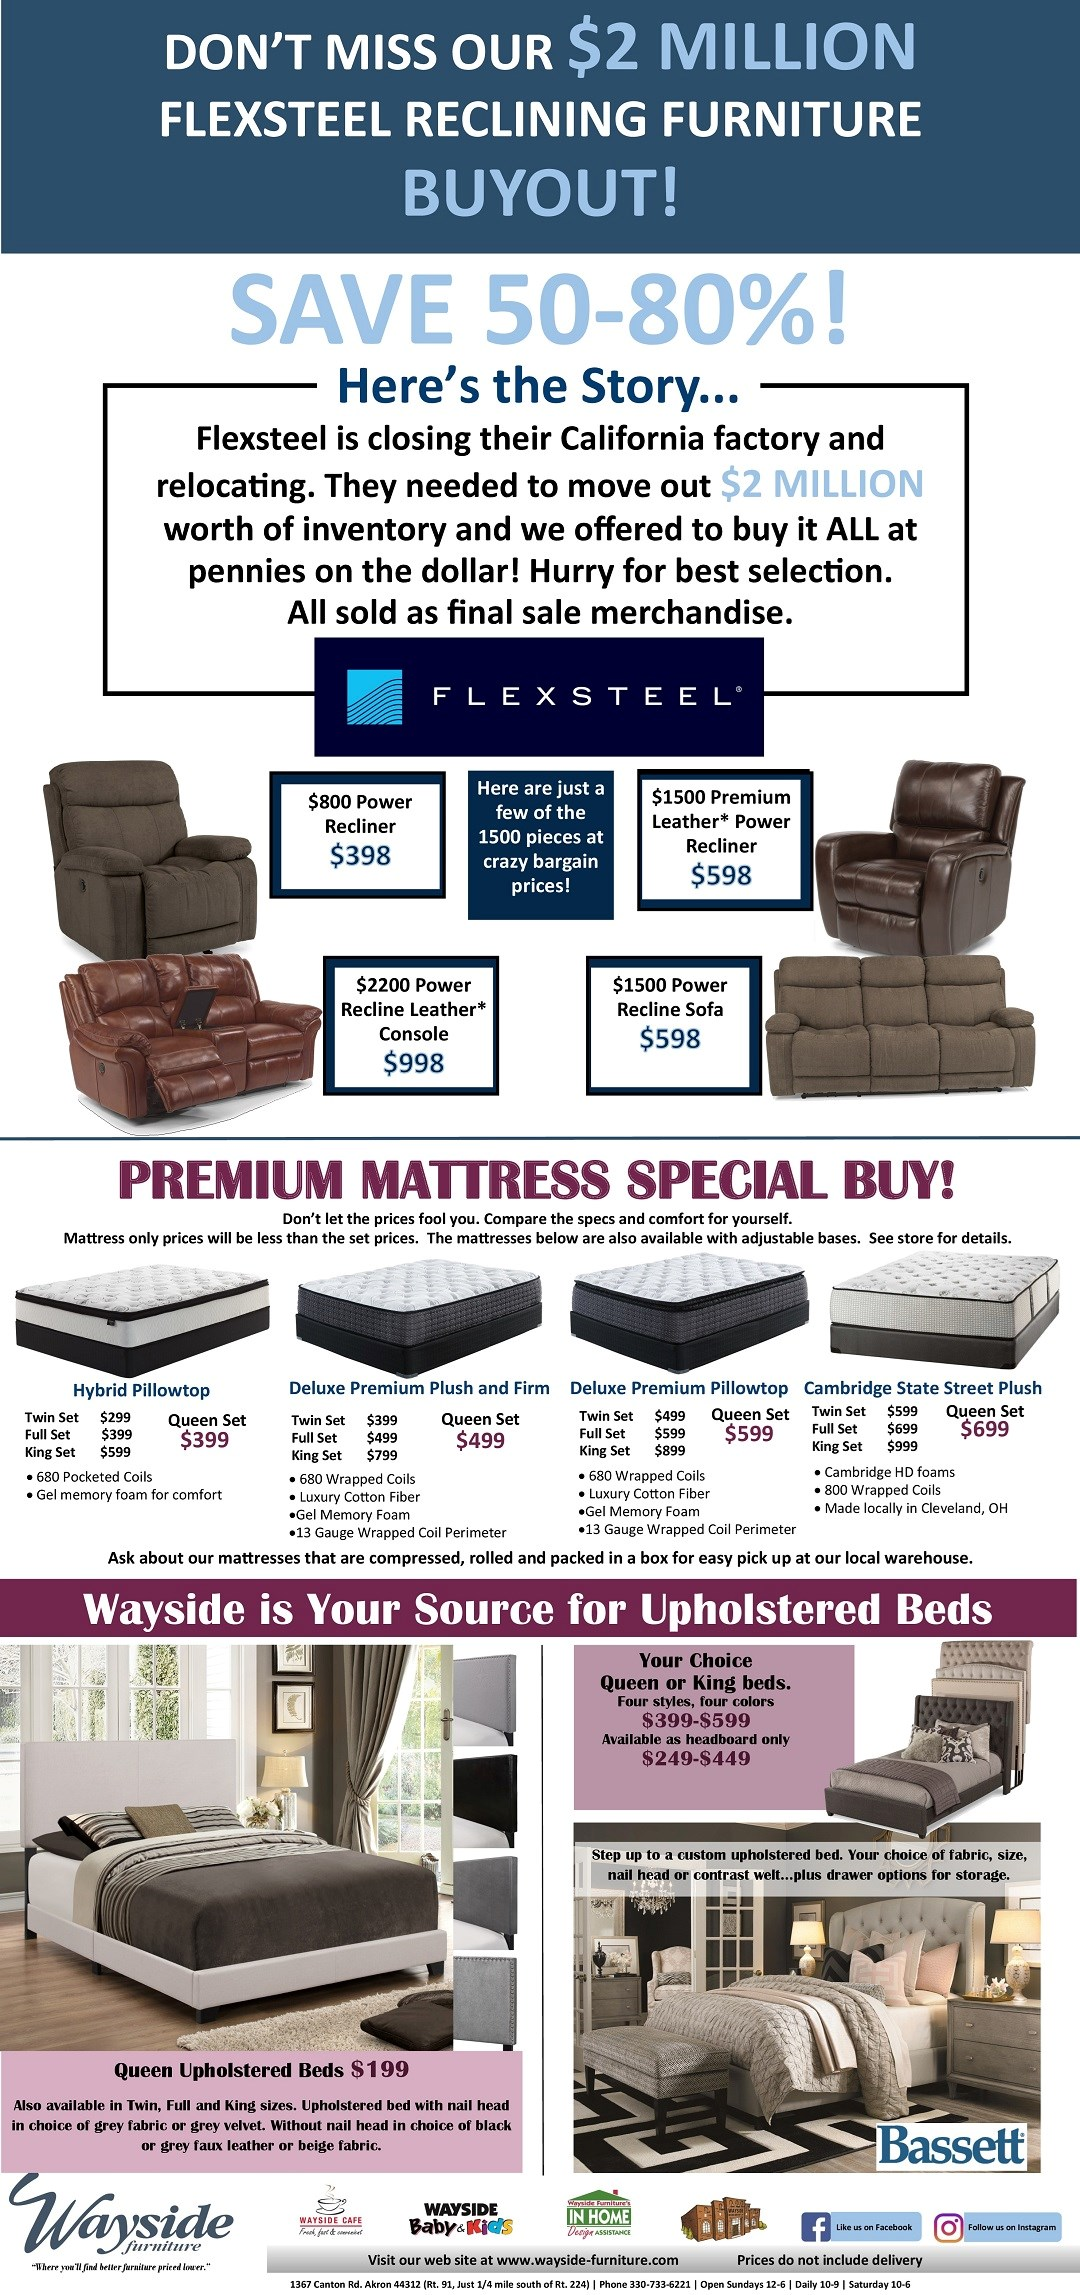 Flexsteel reclining furniture $2 million buyout upholstered beds